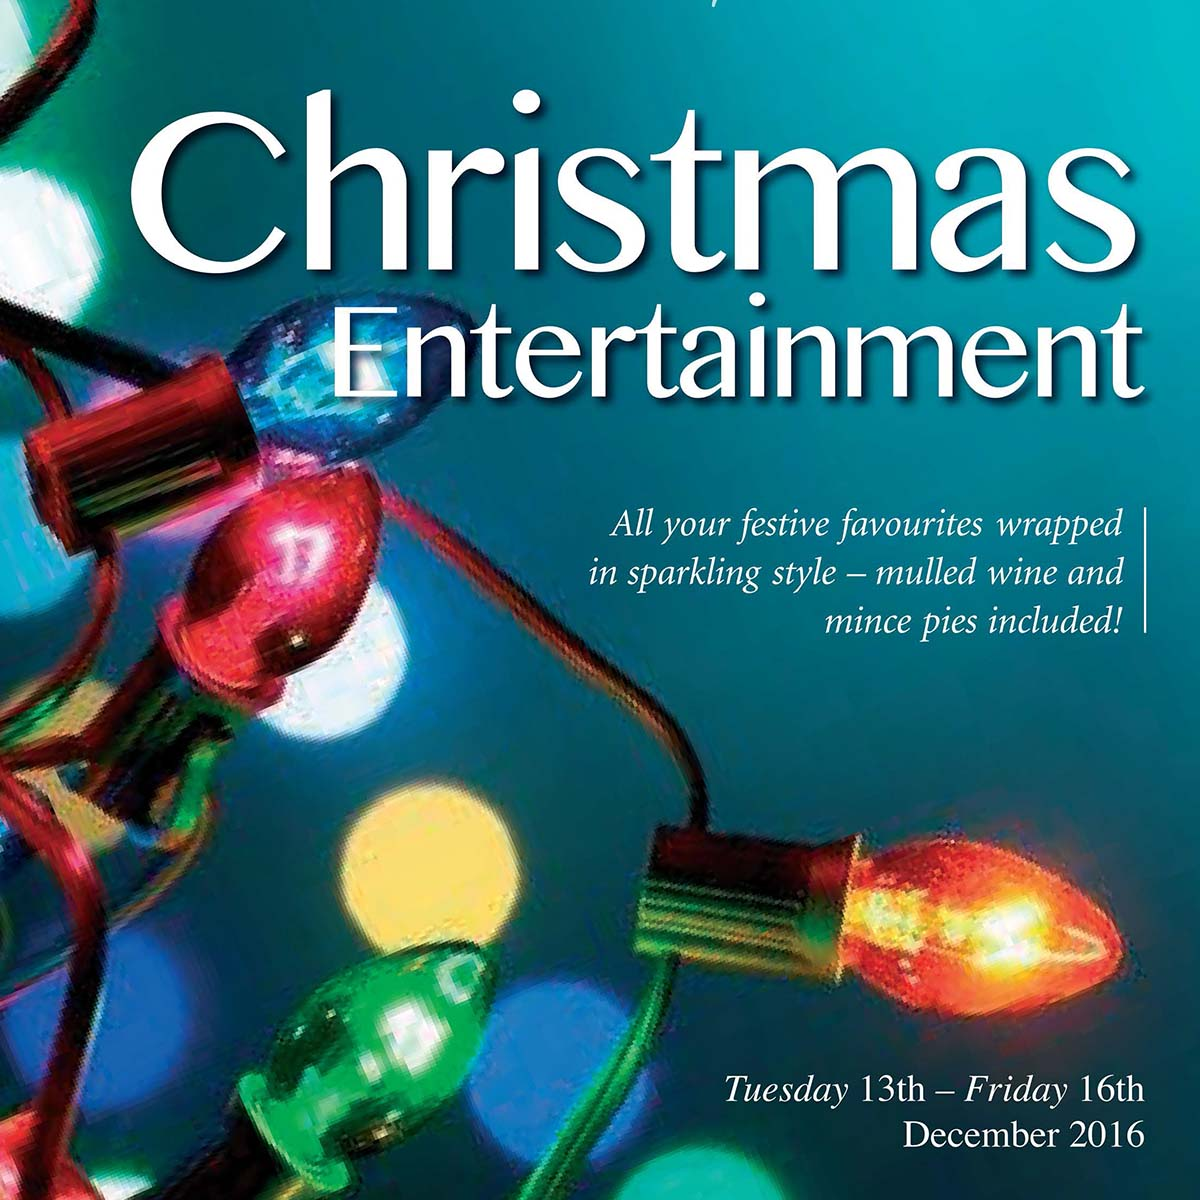 Christmas Entertainment 2016